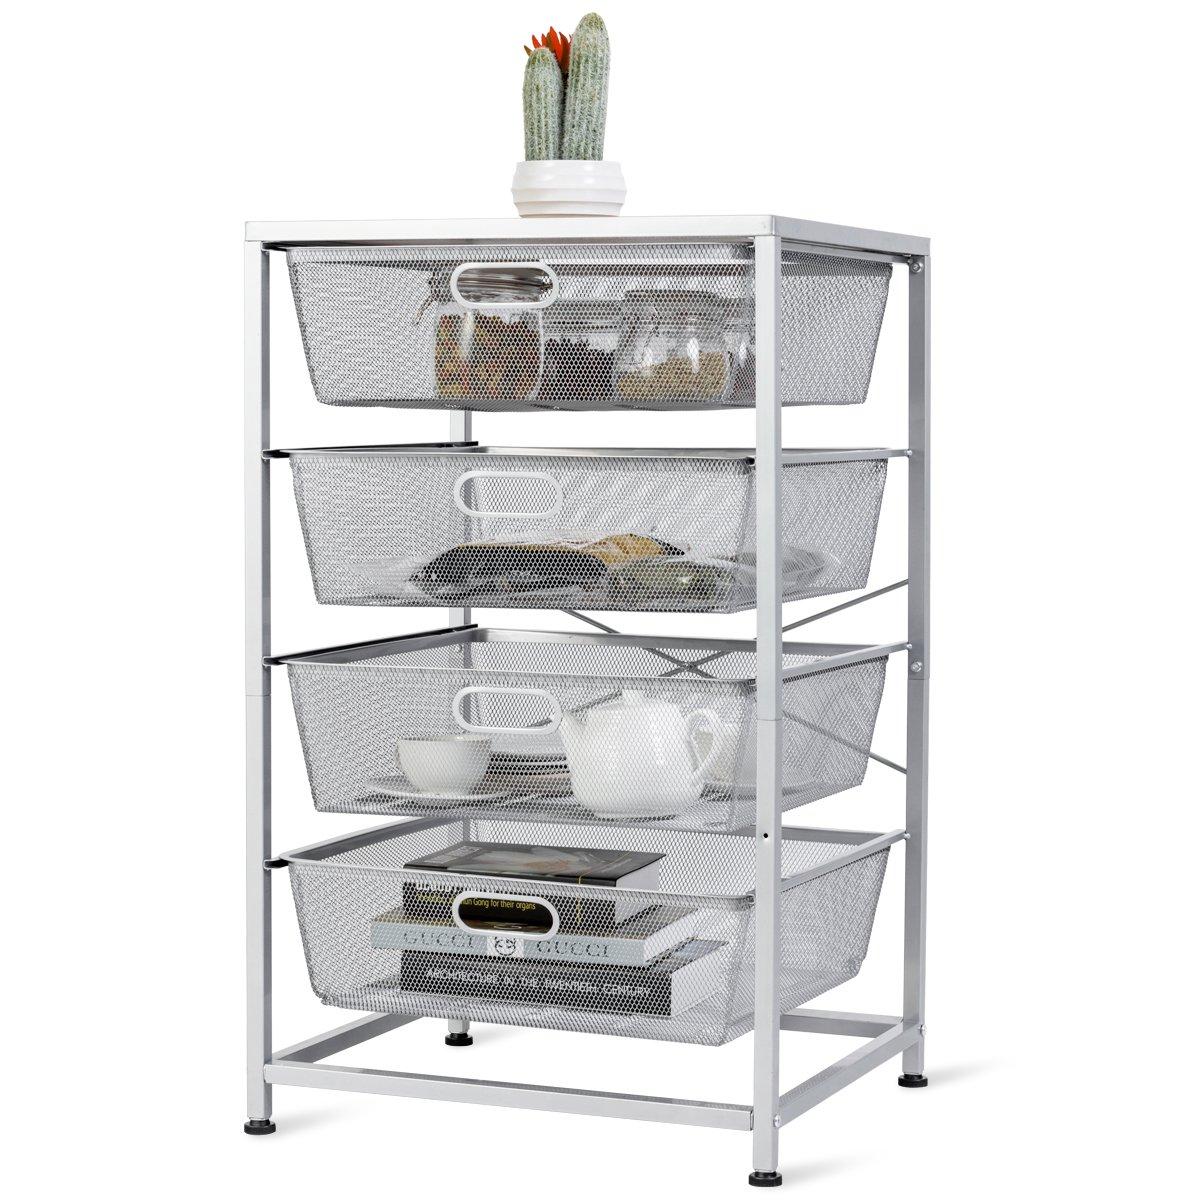 Giantex Mesh Storage Basket 4 Drawer Multifunction Utility Heavy Duty Storage Organizer, for Kitchen and Bathroom Organization